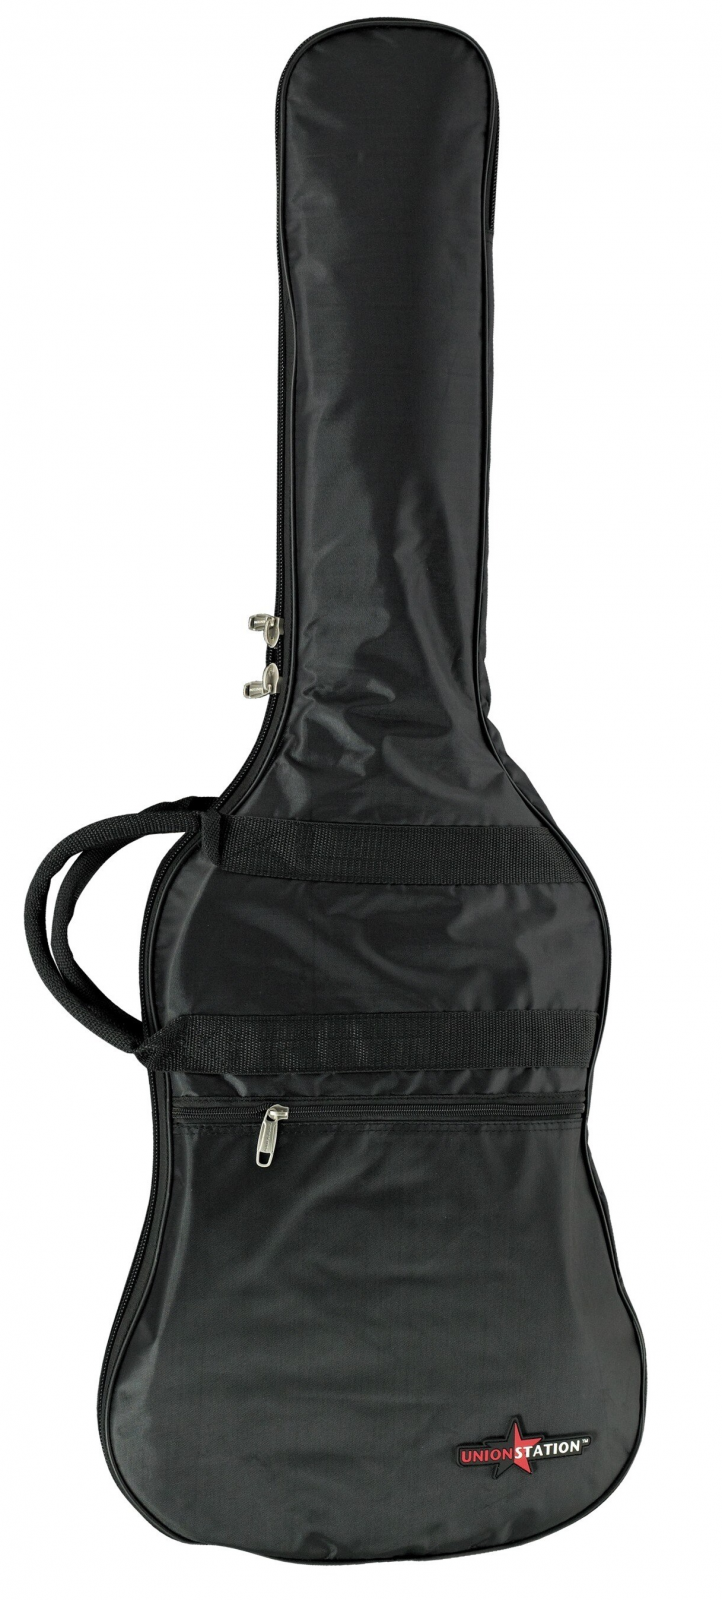 Union Station USB-8B Electric Bass Guitar Bag